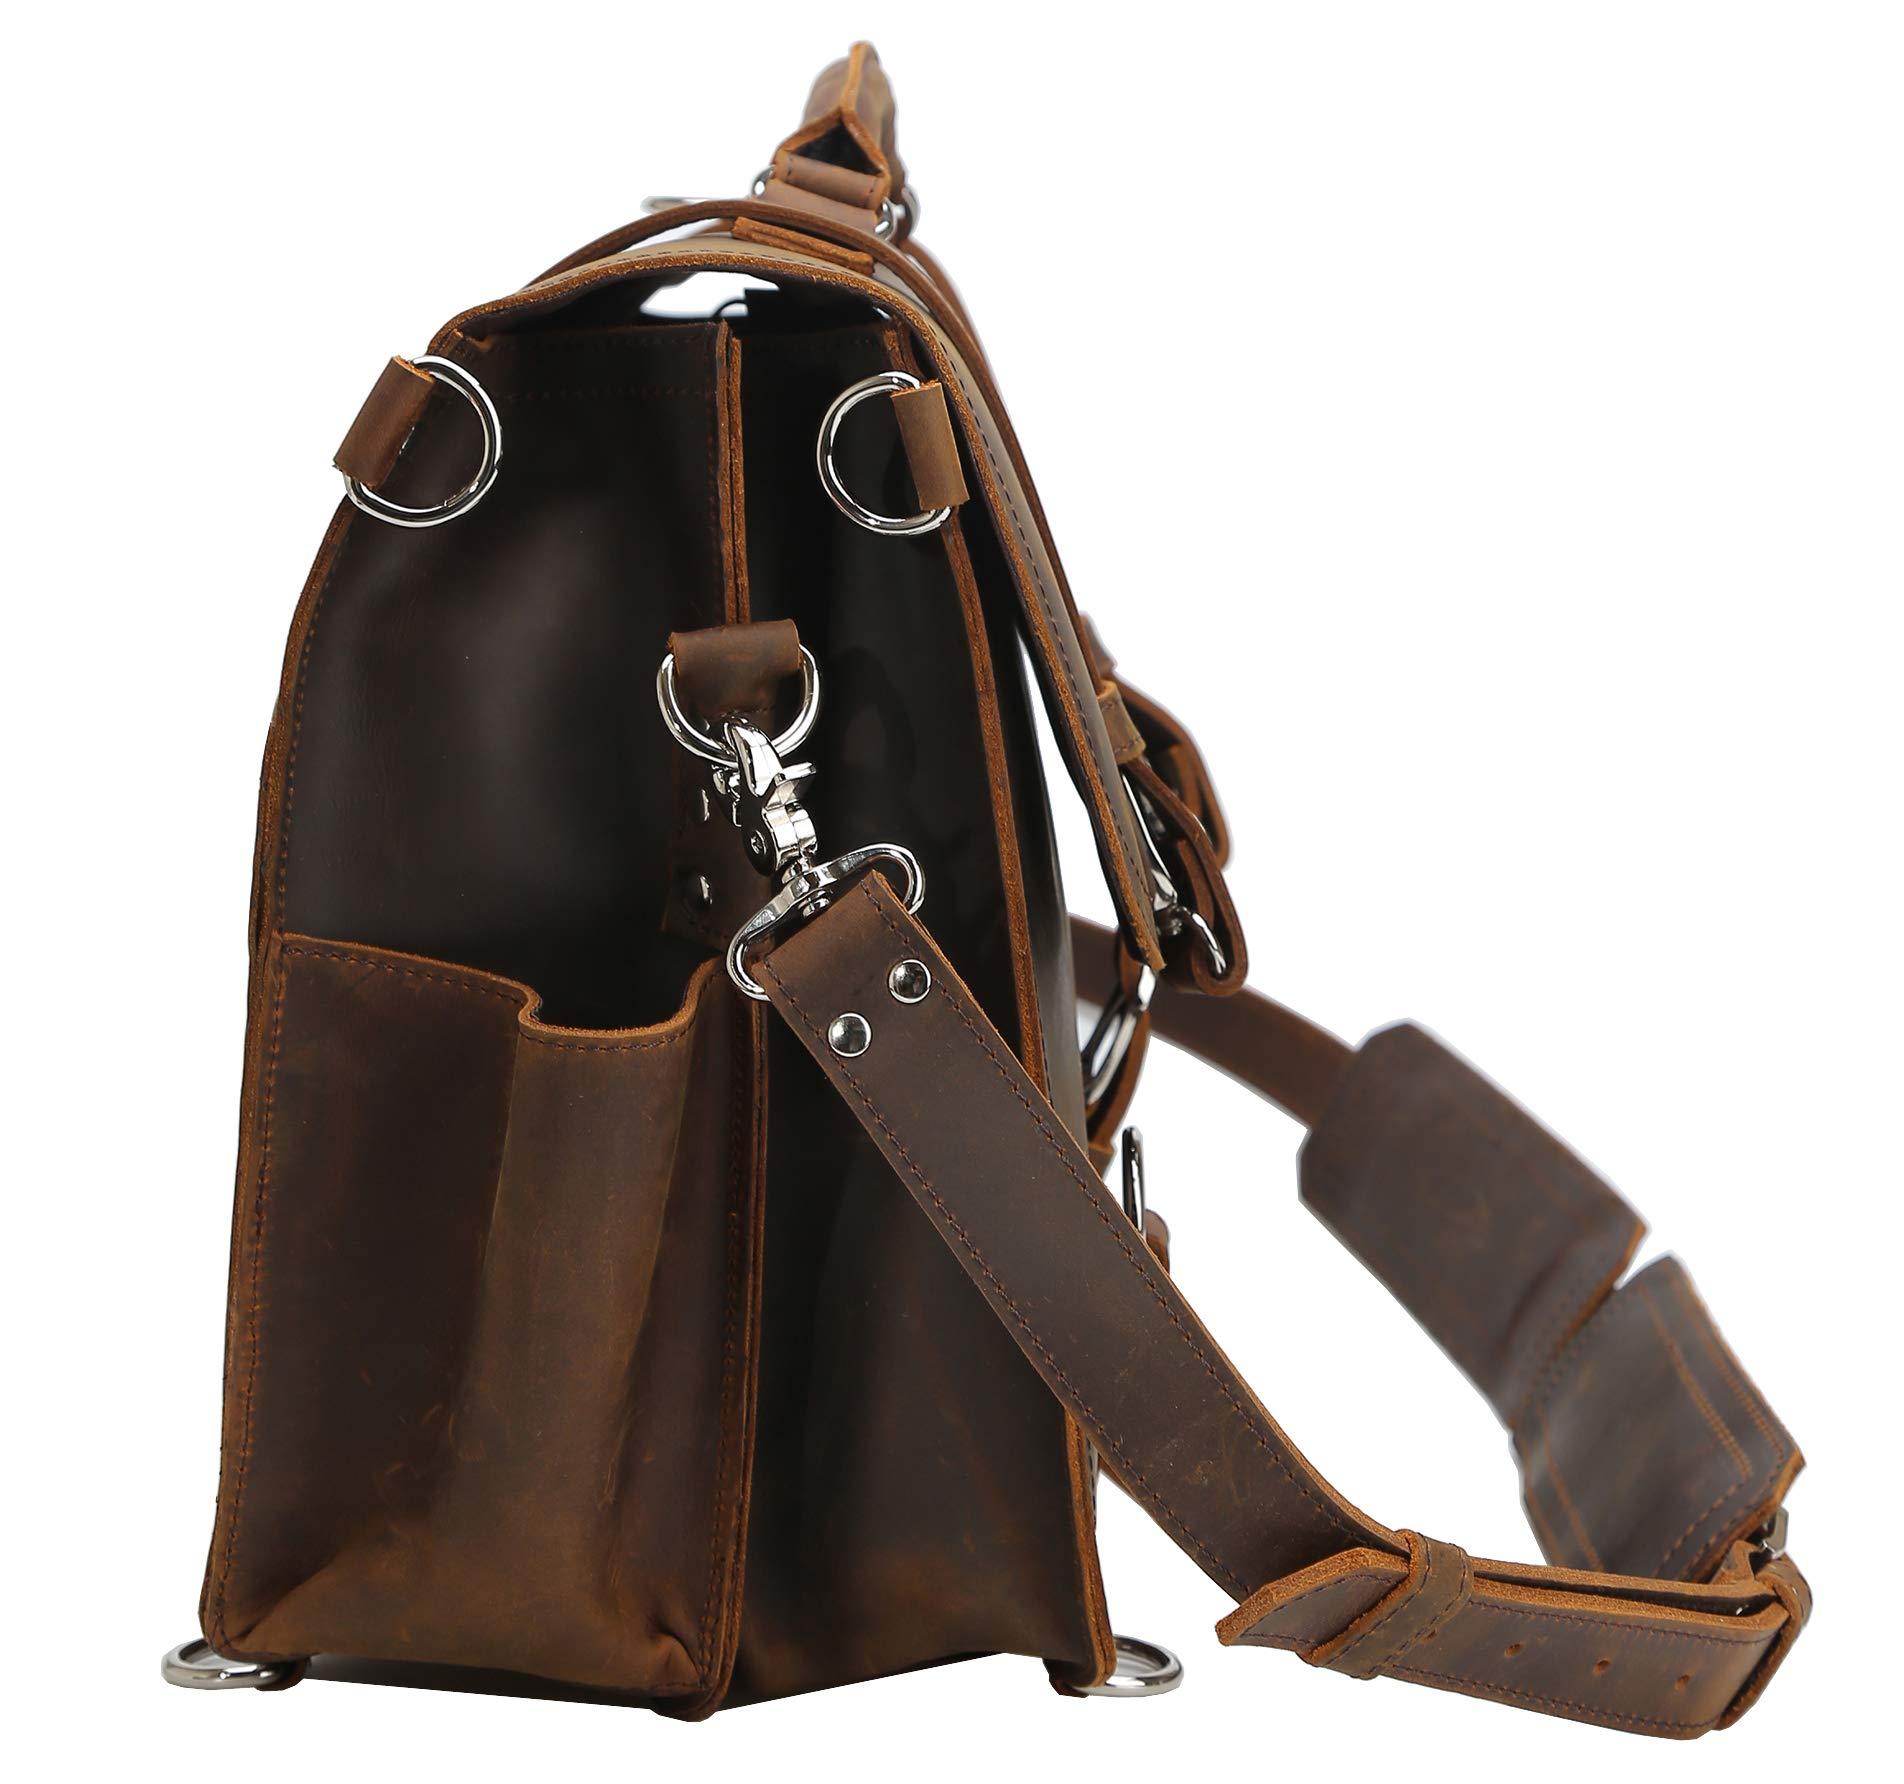 Polare Men's Full Grain Leather 16'' Laptop Briefcase Shoulder Messenger Bag by Polare (Image #5)